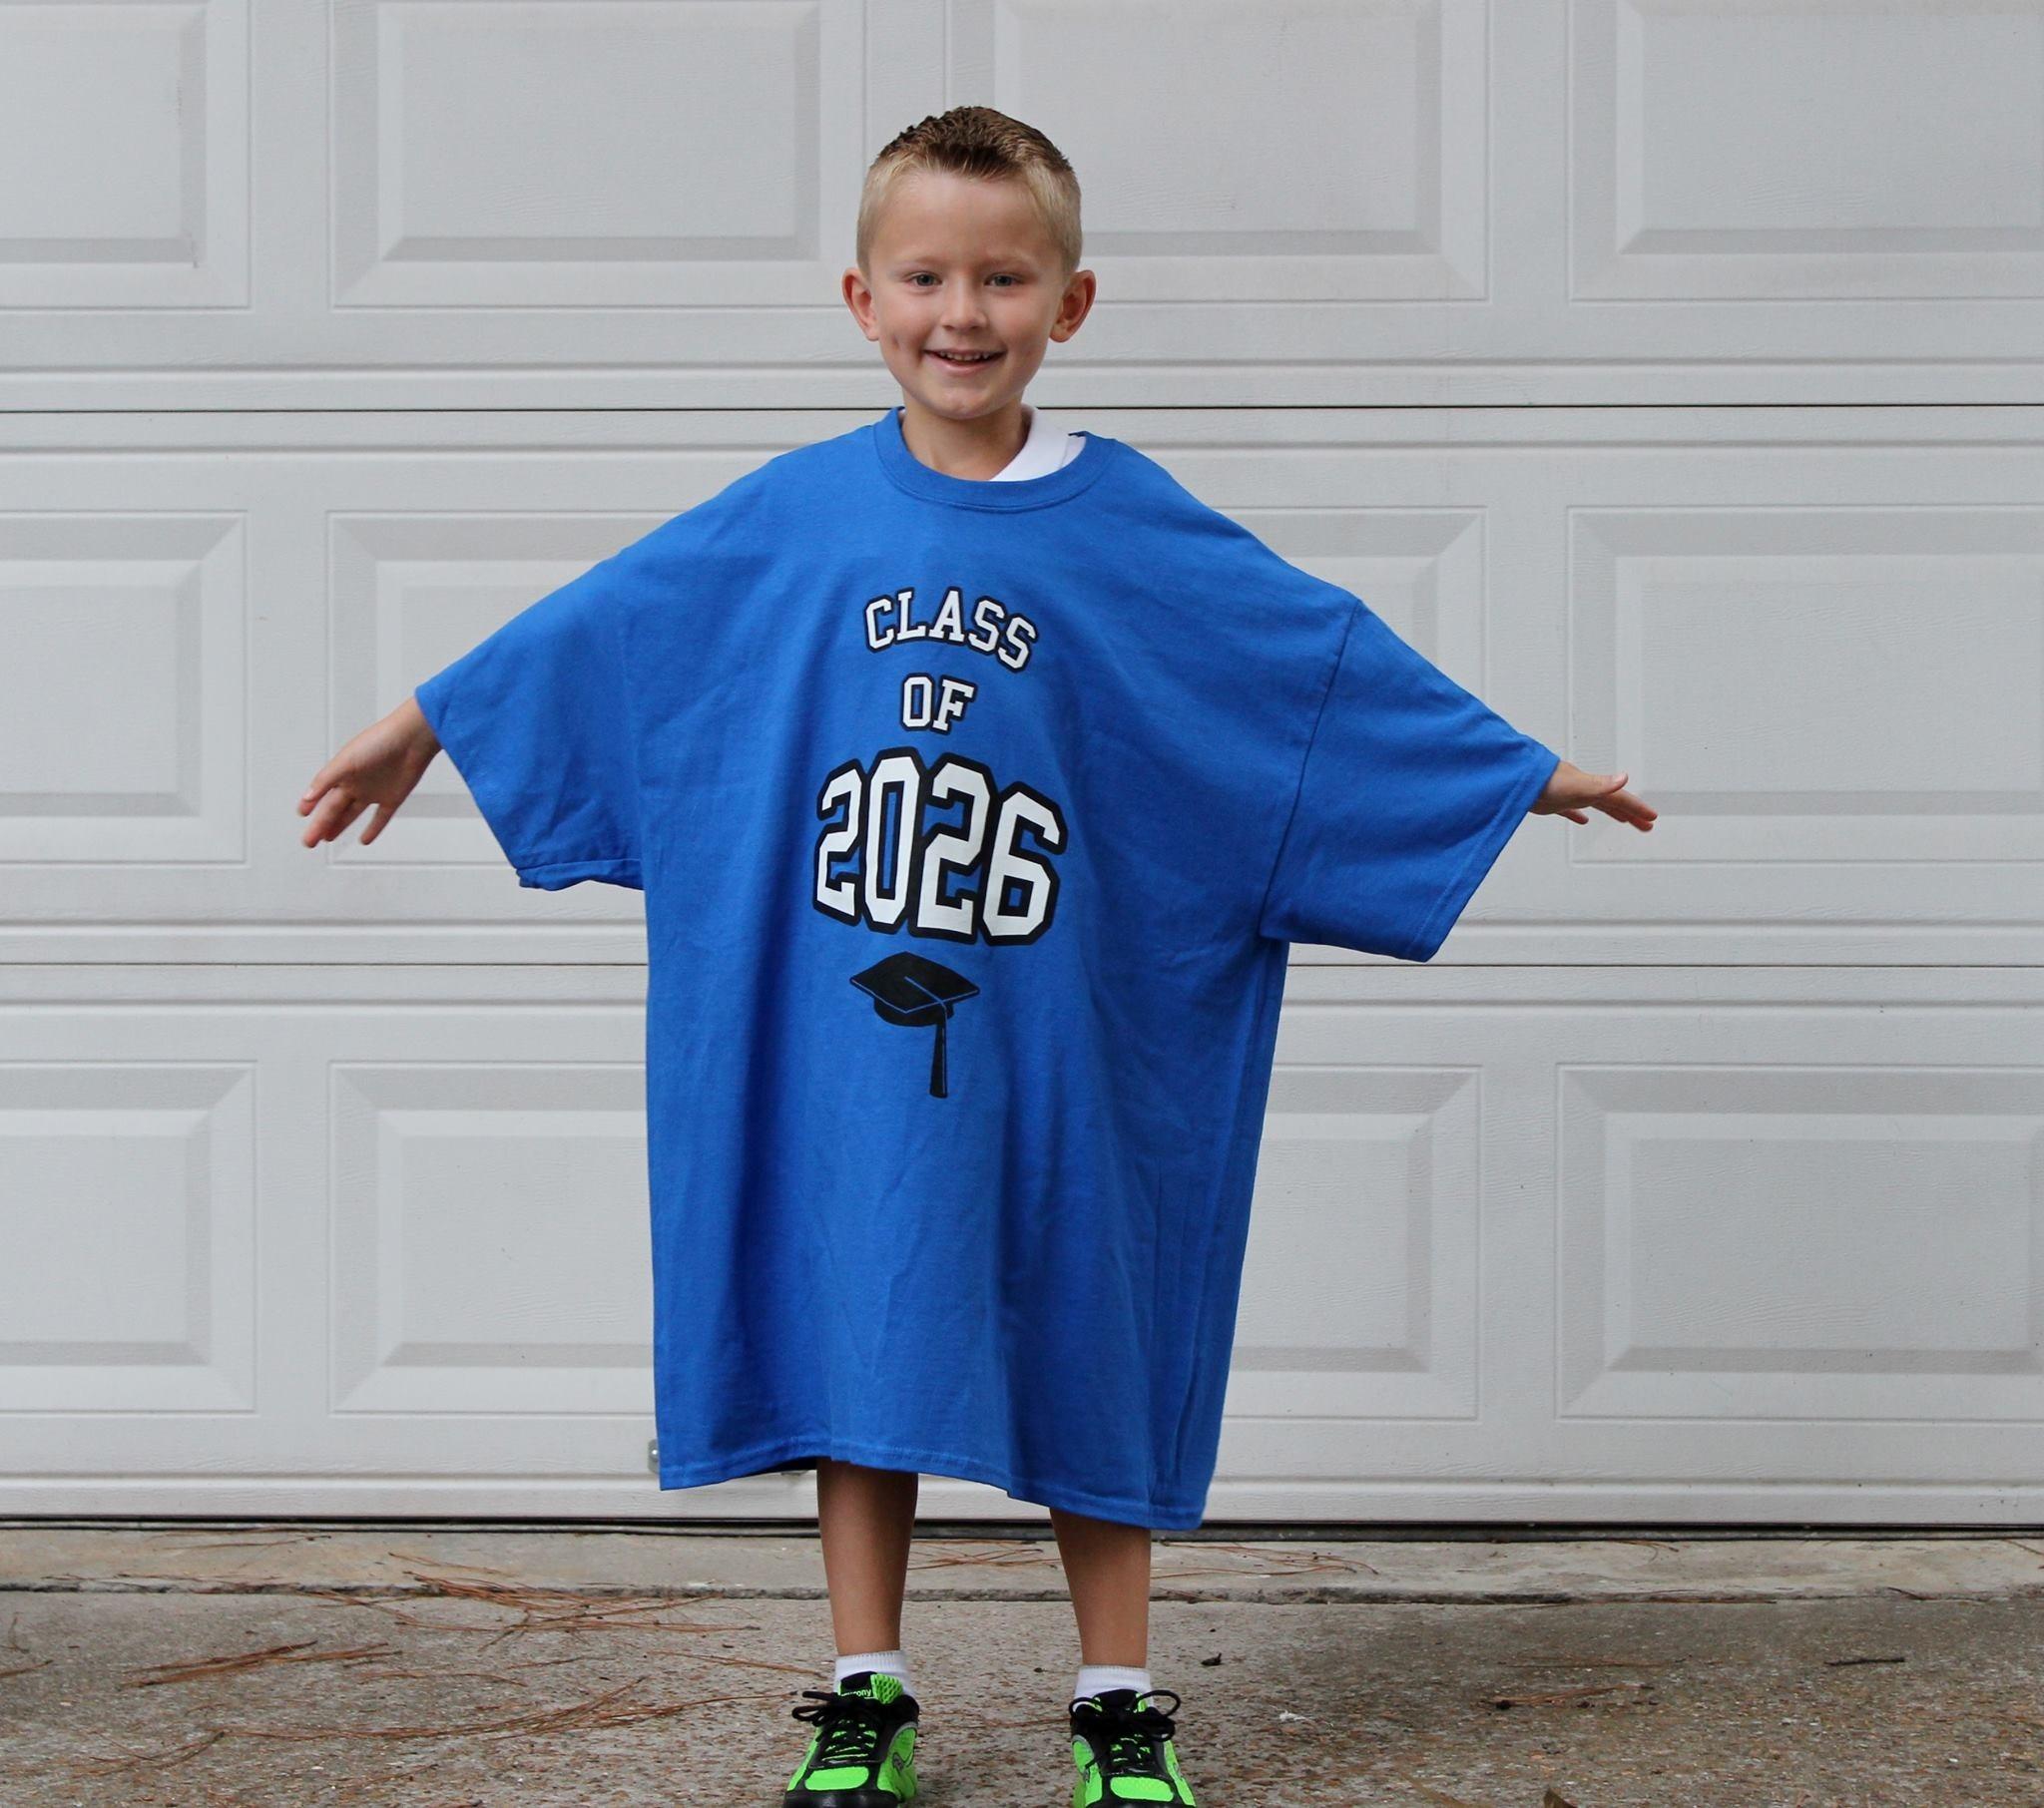 Custom T-Shirts for The Graduating Class Of 2026 - Shirt Design Ideas